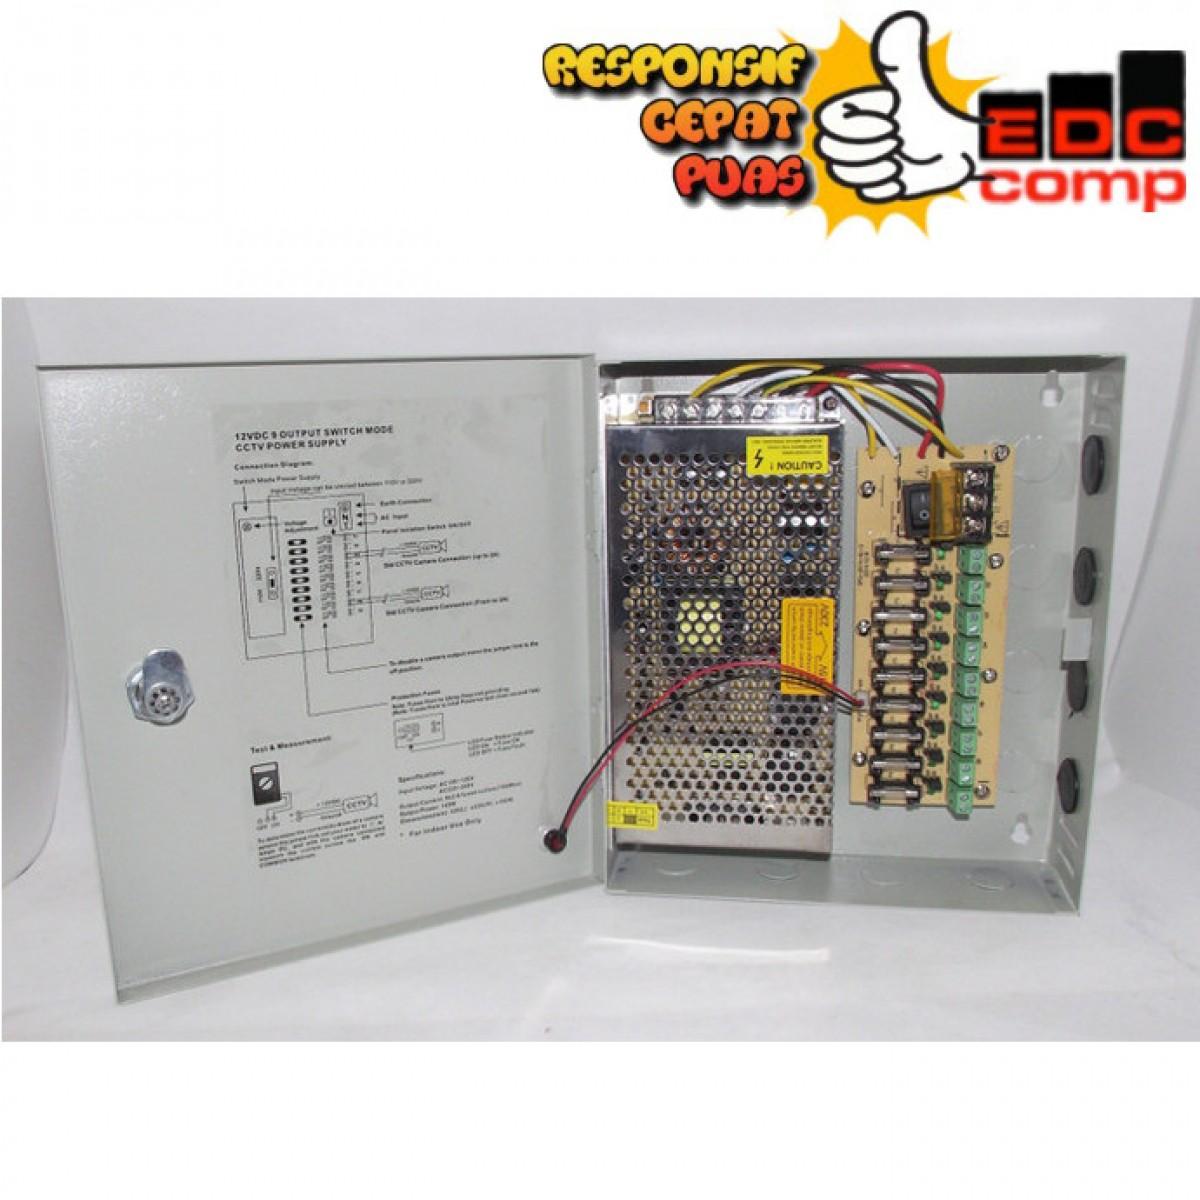 Switching Power Supply CCTV 12V 9CH - EdcComp